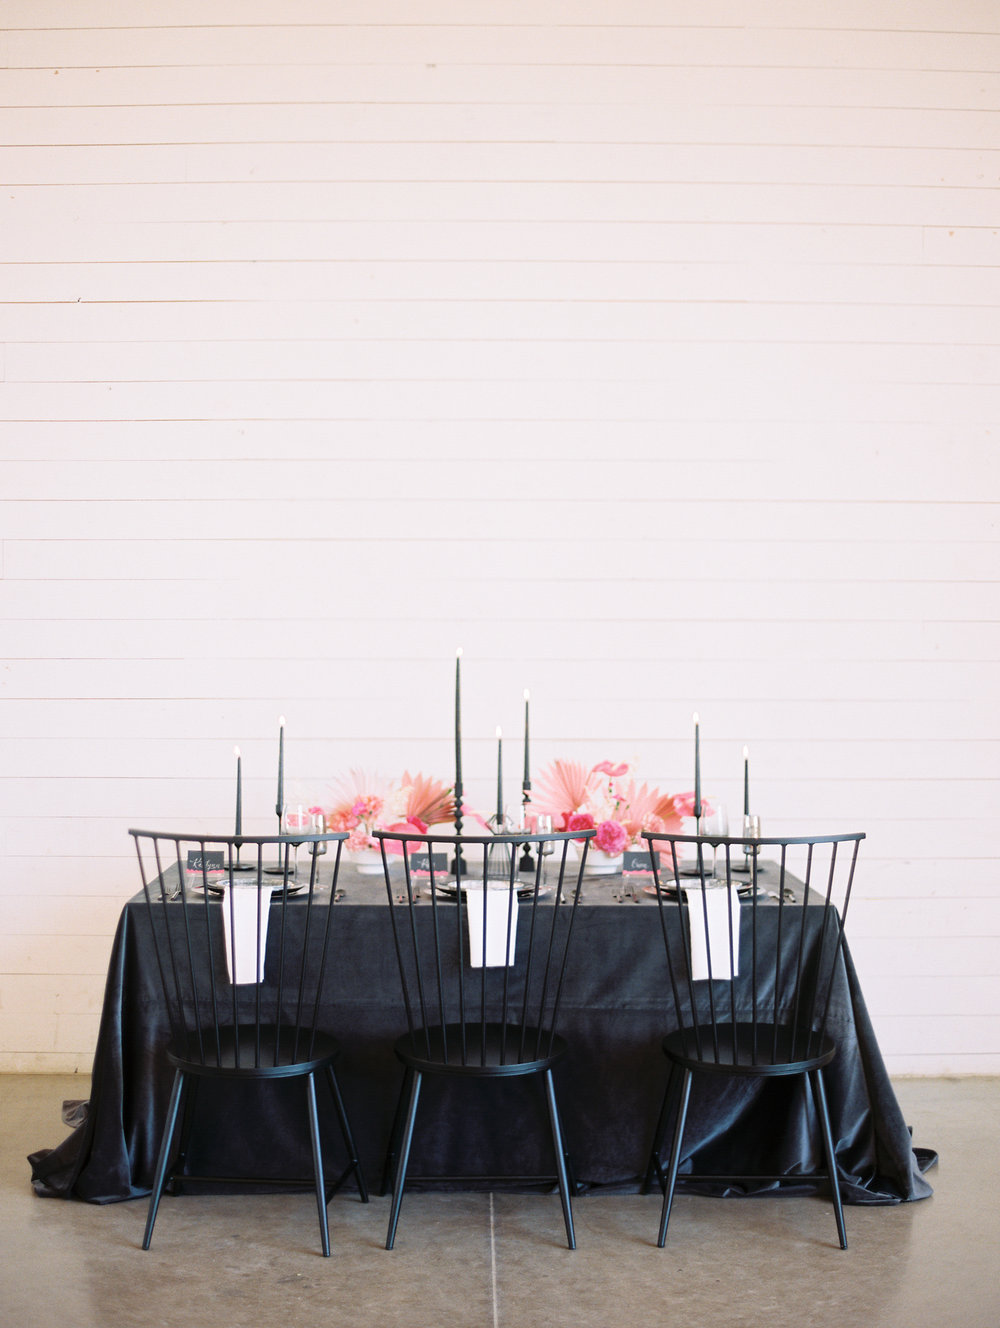 Kristin-La-Voie-Photography-Austin-Wedding-Photographer-Prospect-House-4.jpg